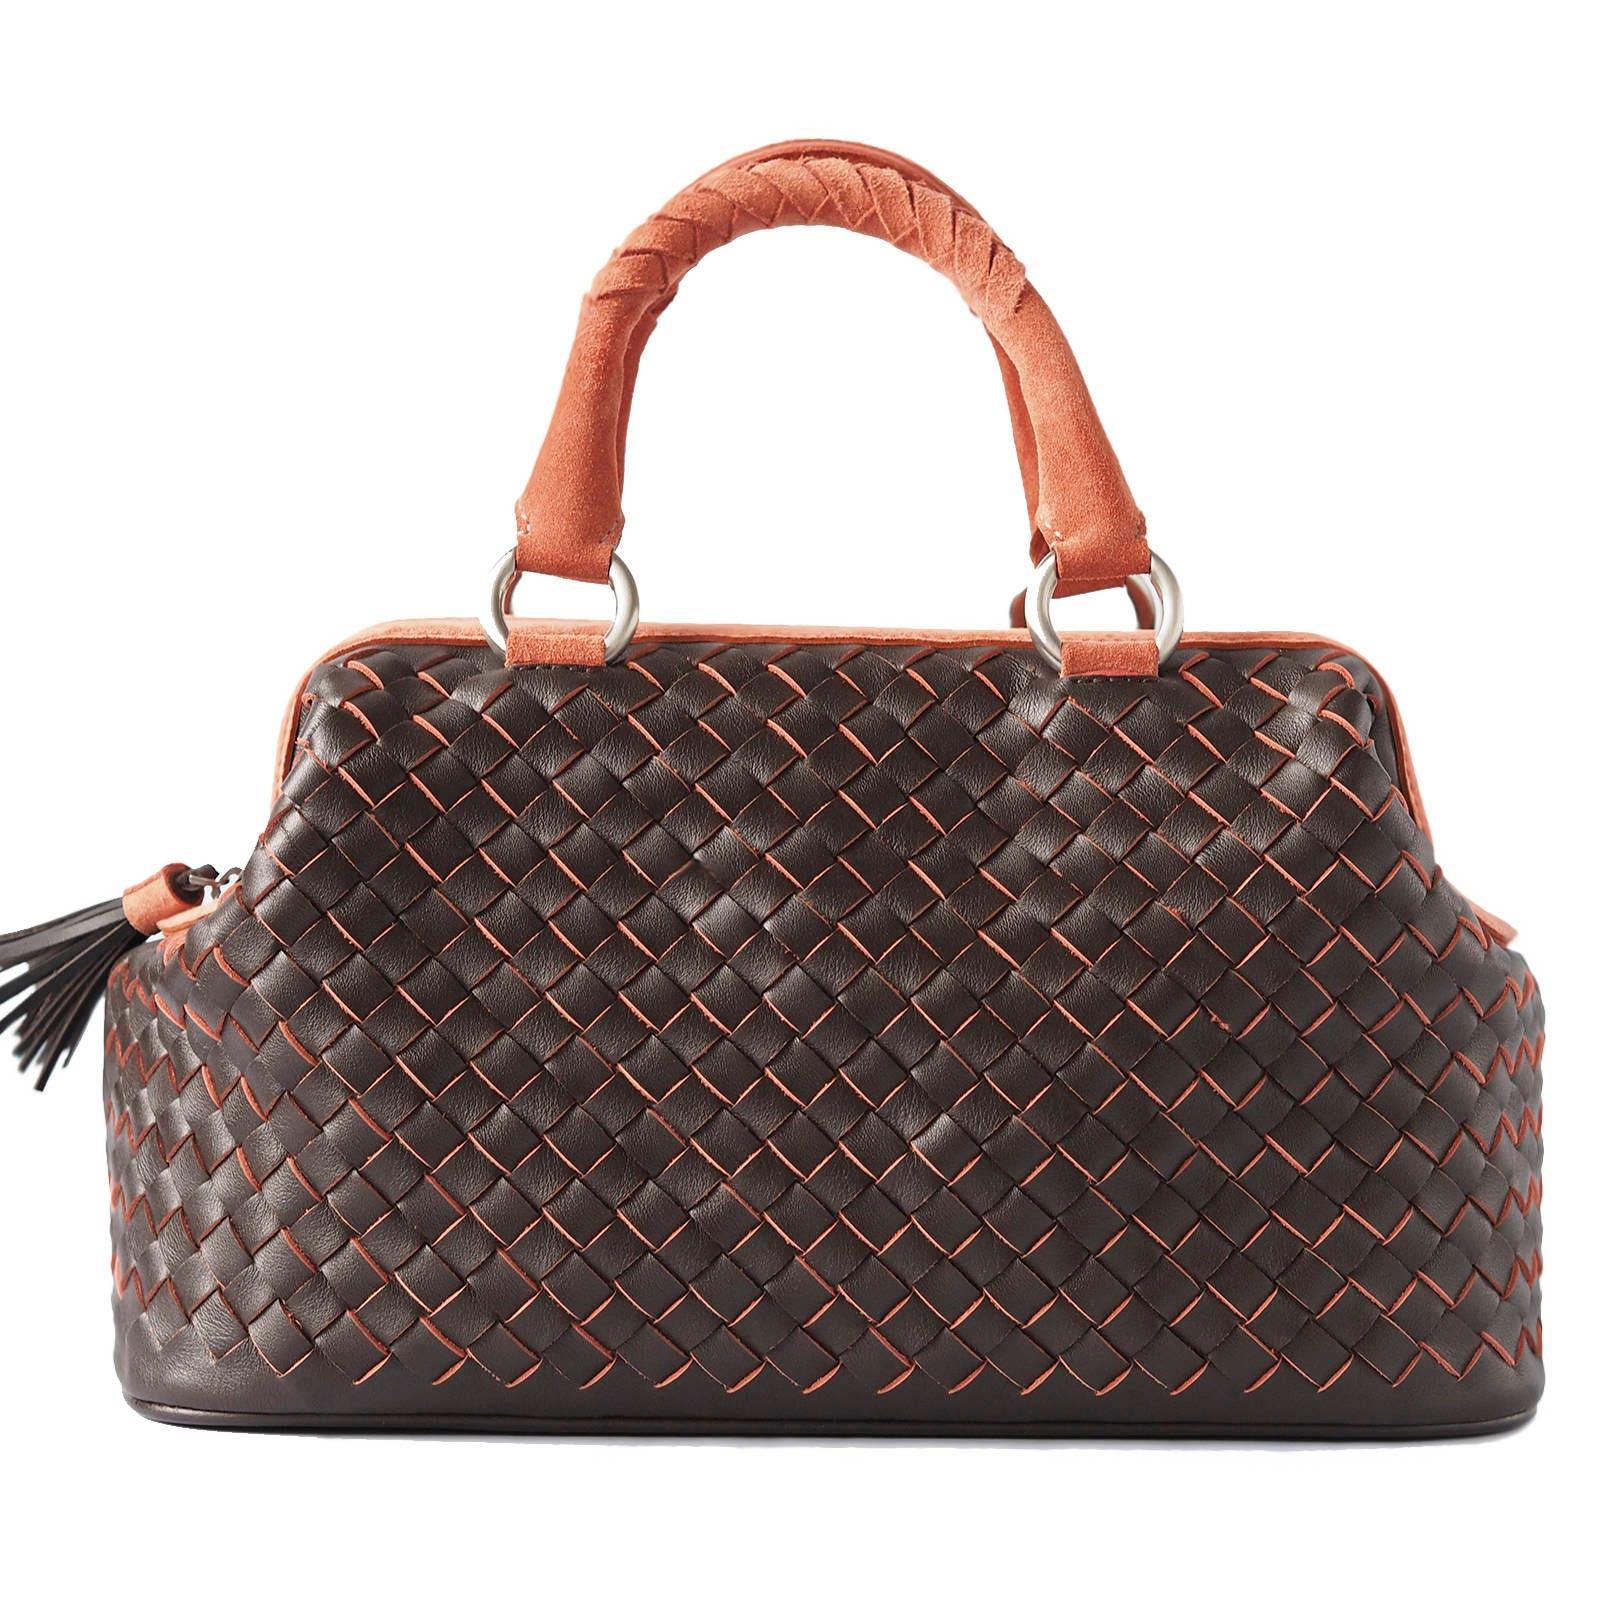 Leather Bag Valise Aurora Leather Tote Bags Designer Handbags  5390468aba101